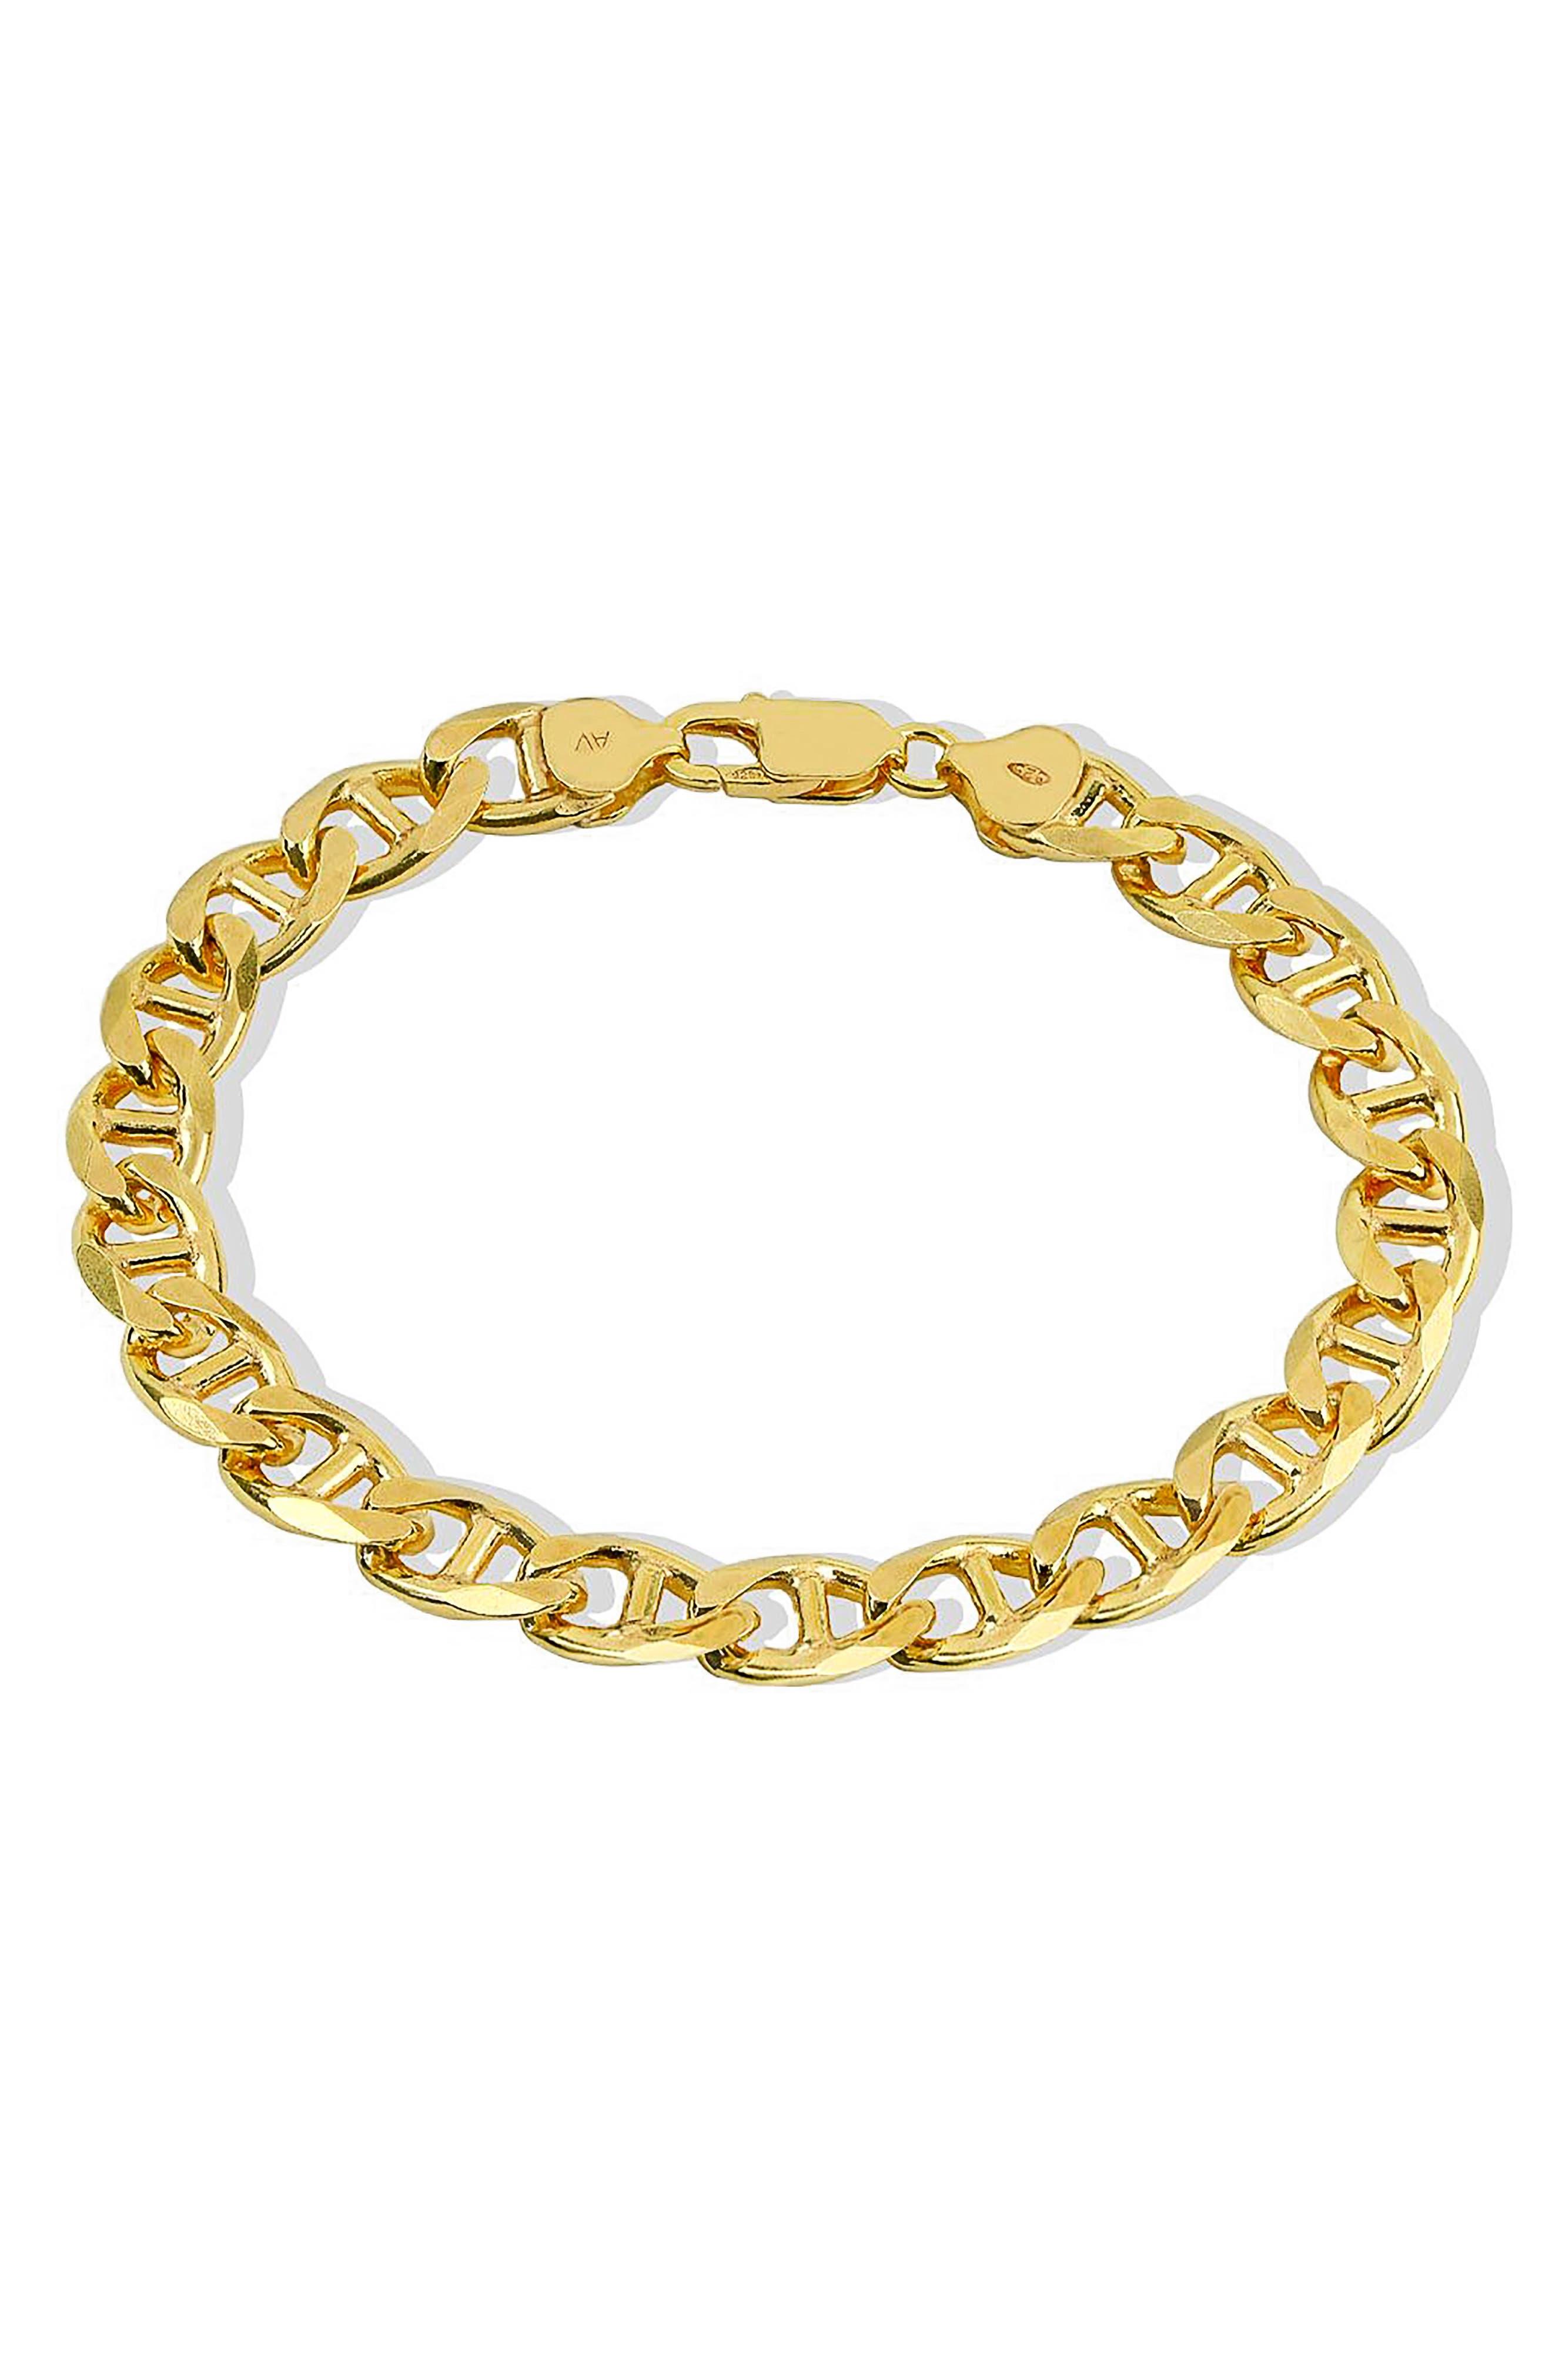 Men's Oval Link Bracelet